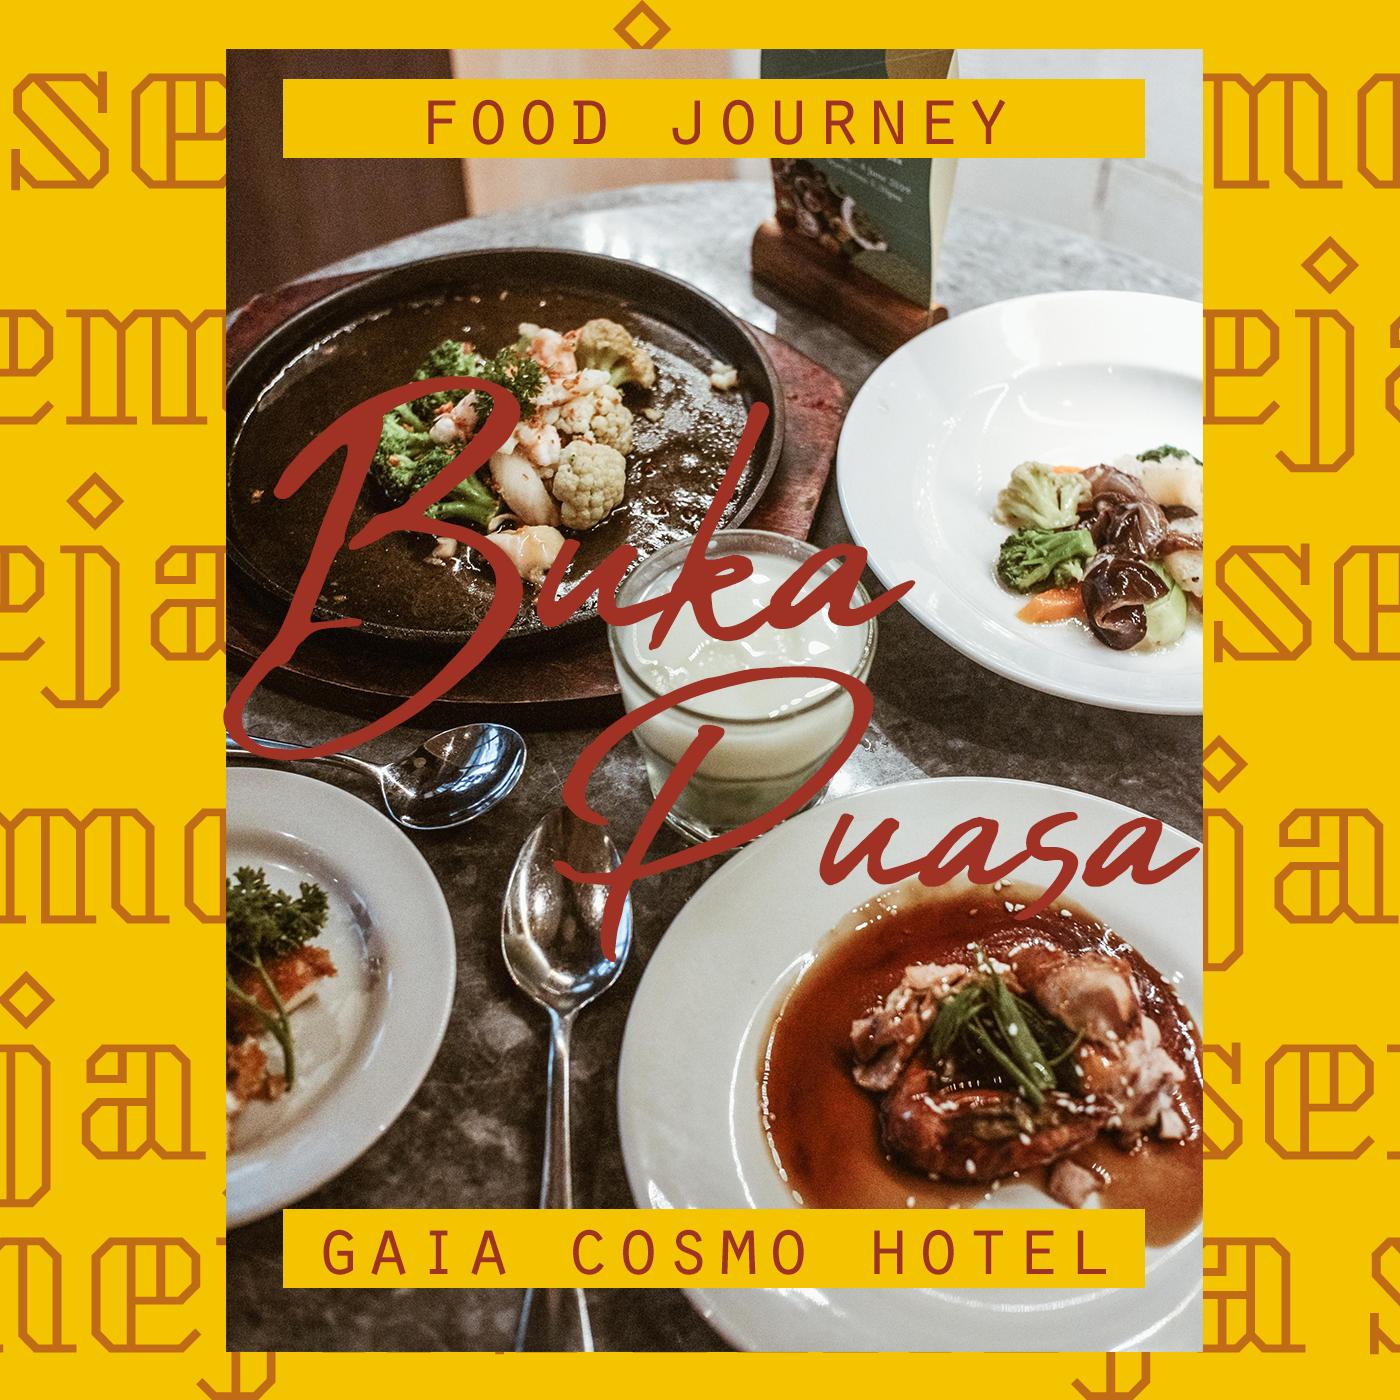 all you can eat gaia cosmo hotel jogja